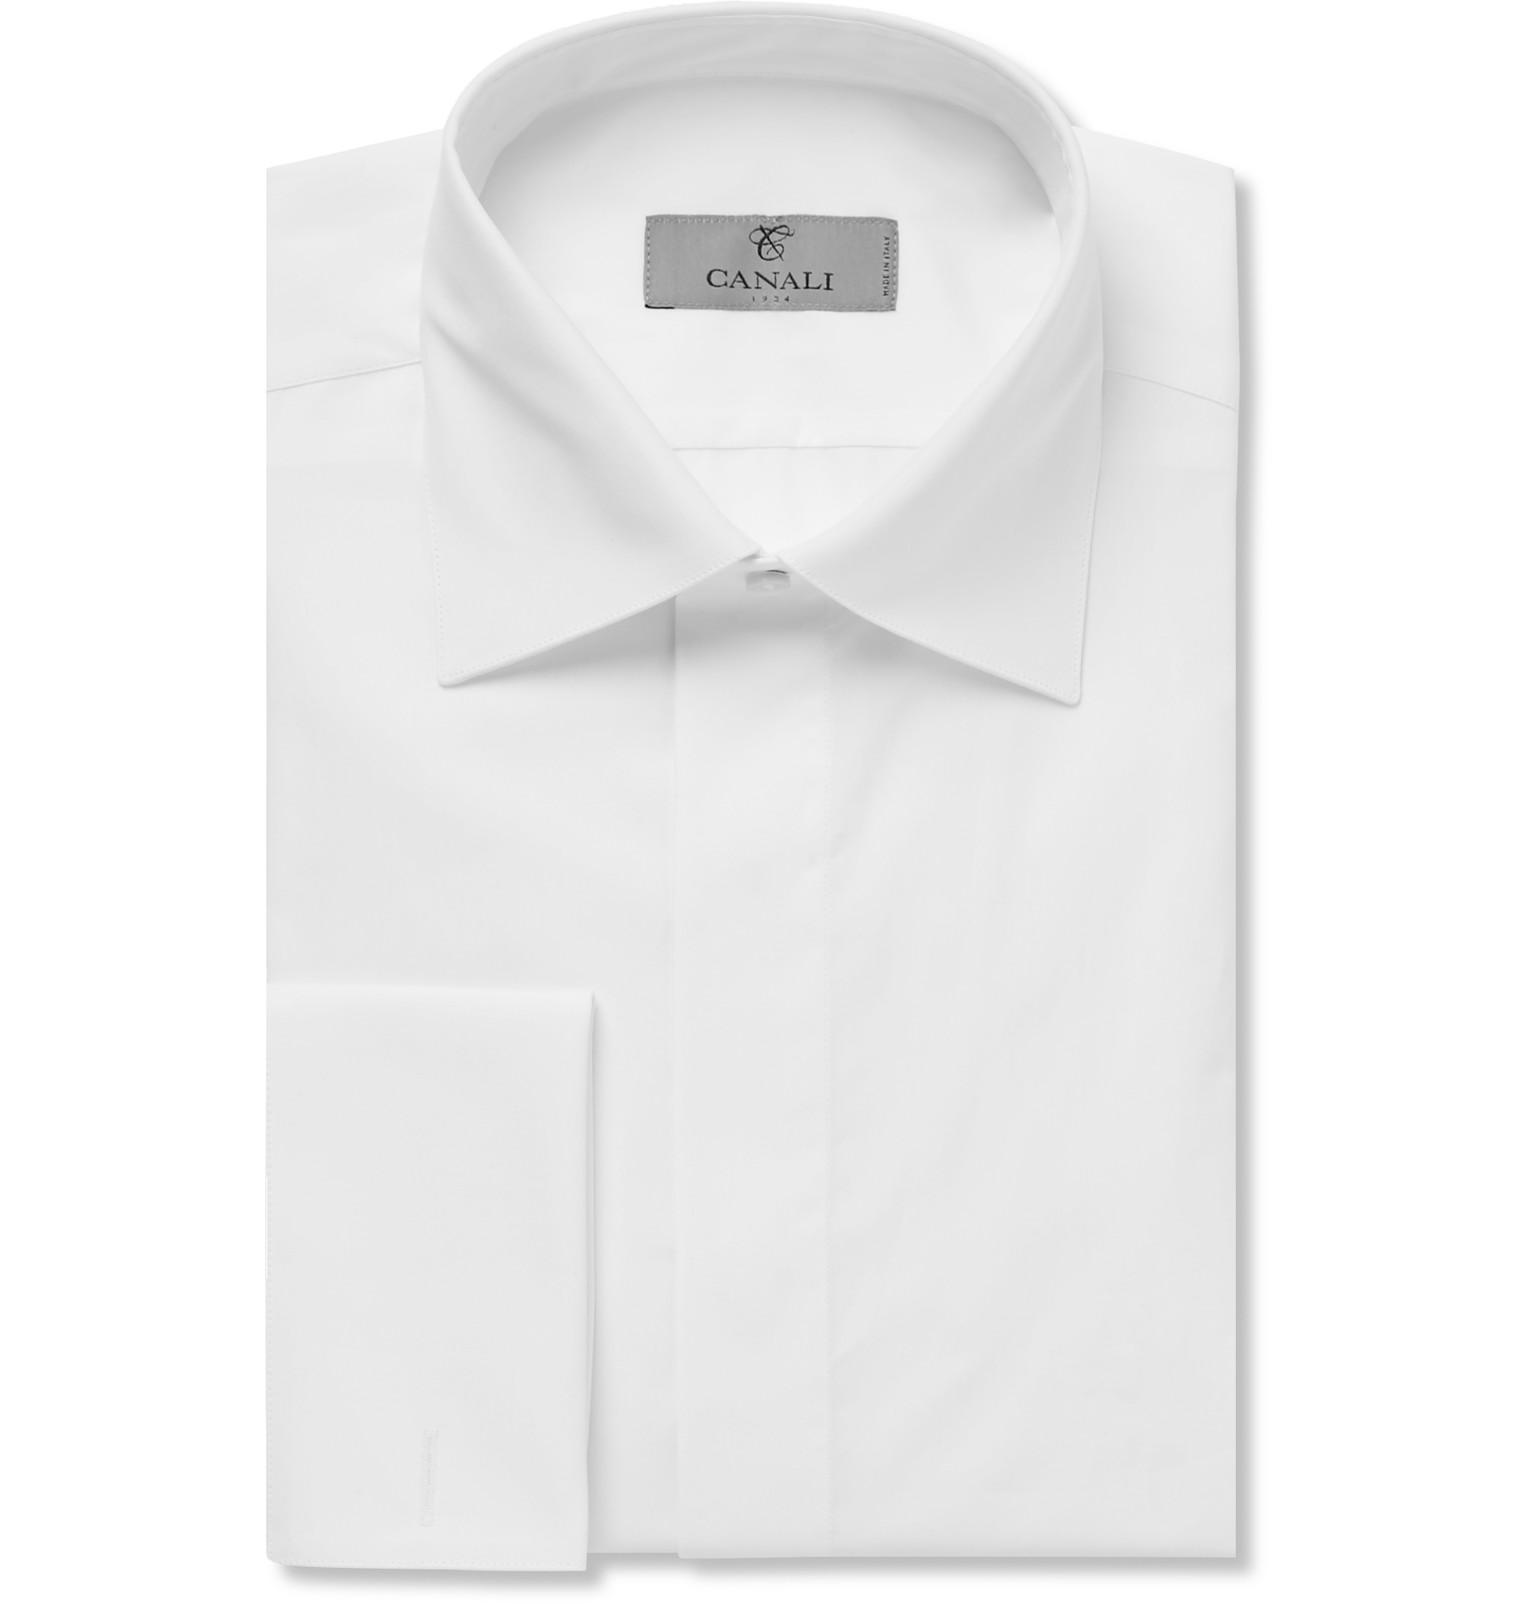 White cotton dress shirts.